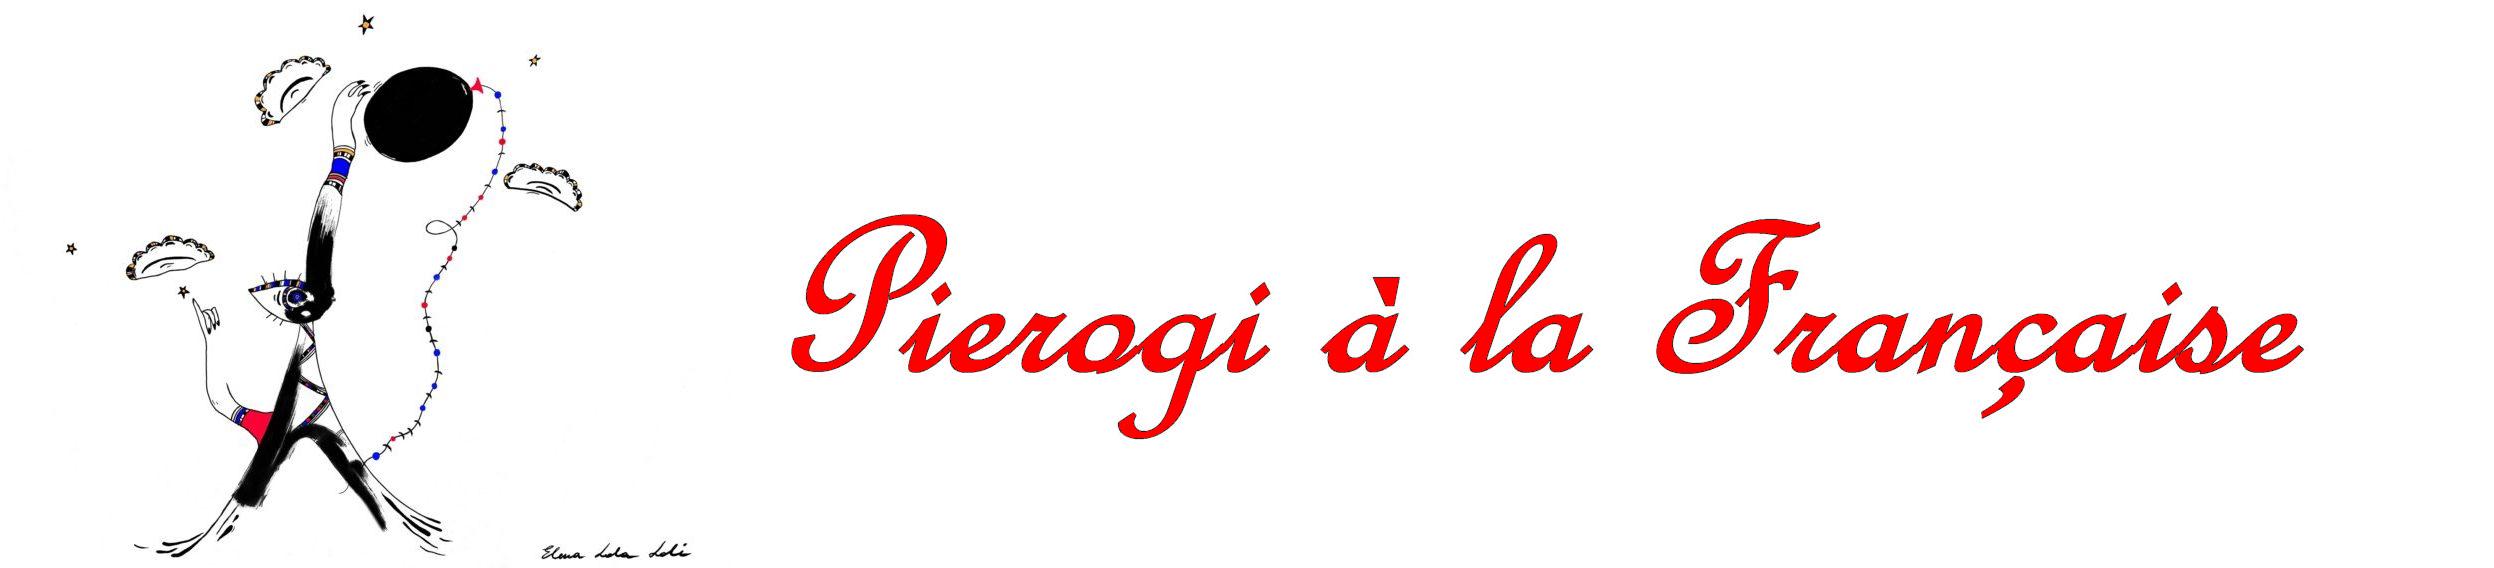 pierogi, pierogi à la Française, blog culinaire, recettes, przepisy